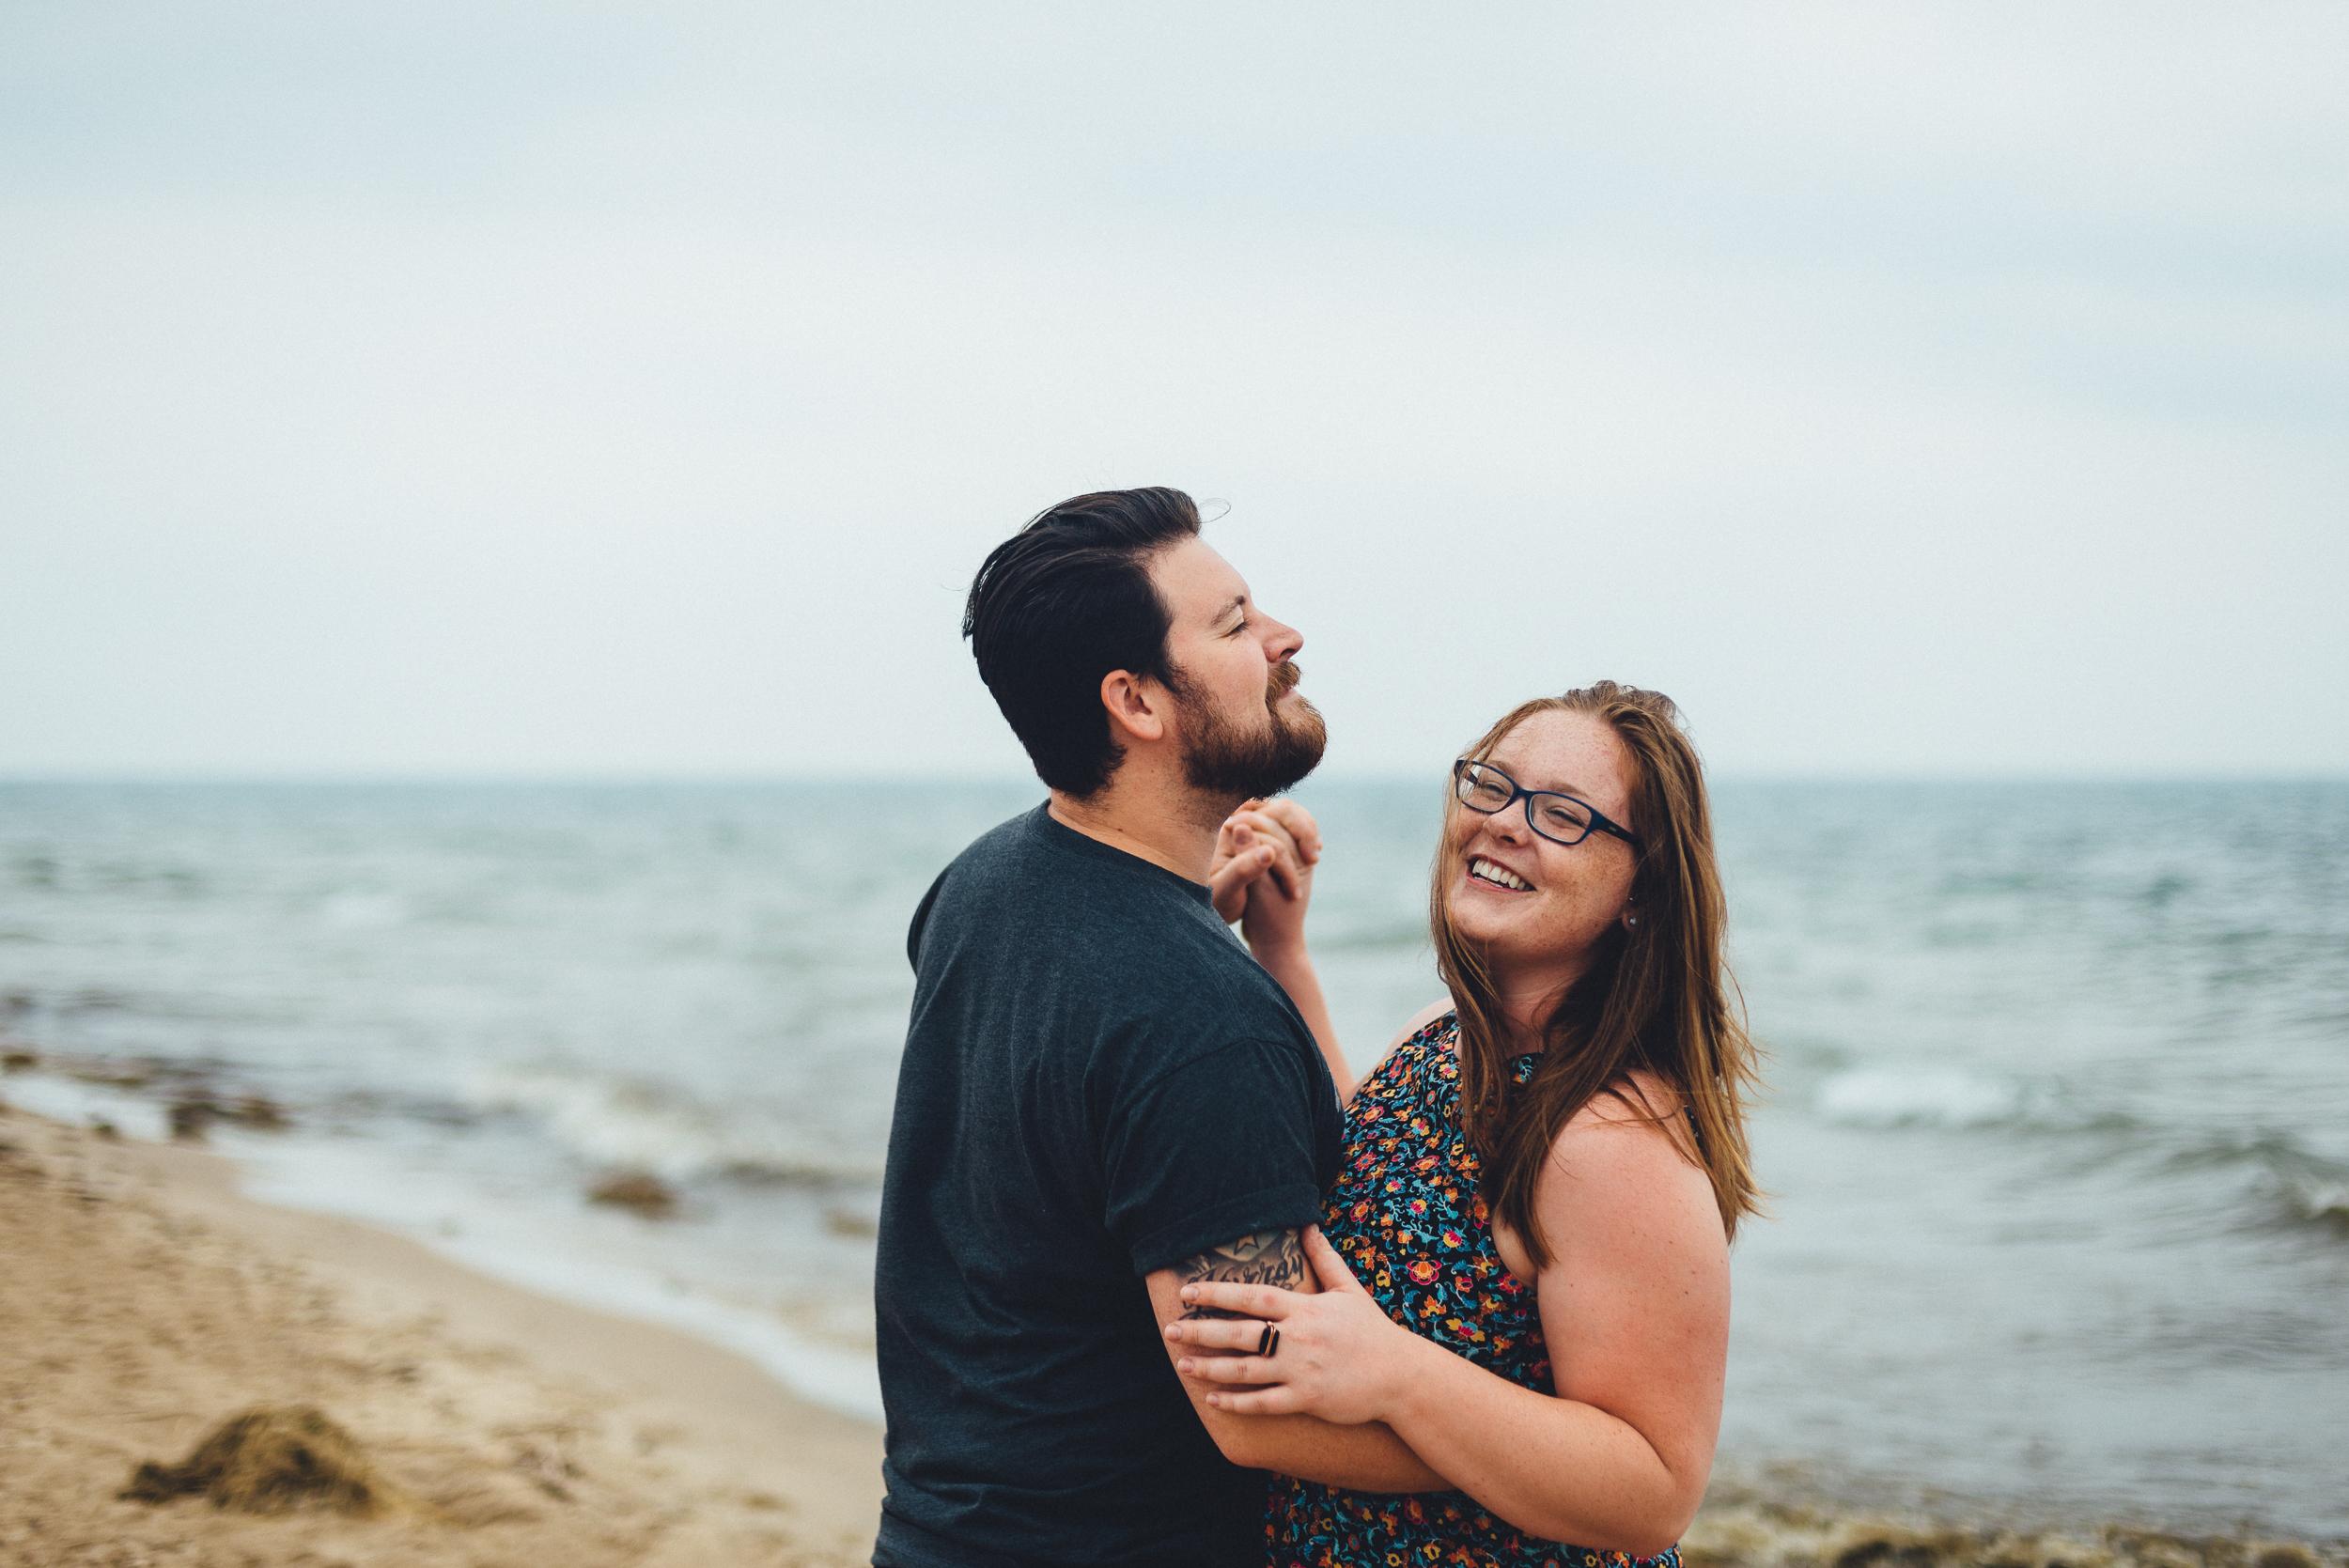 beach_couple_photography_engagment_love_long_island_photographer-17.jpg